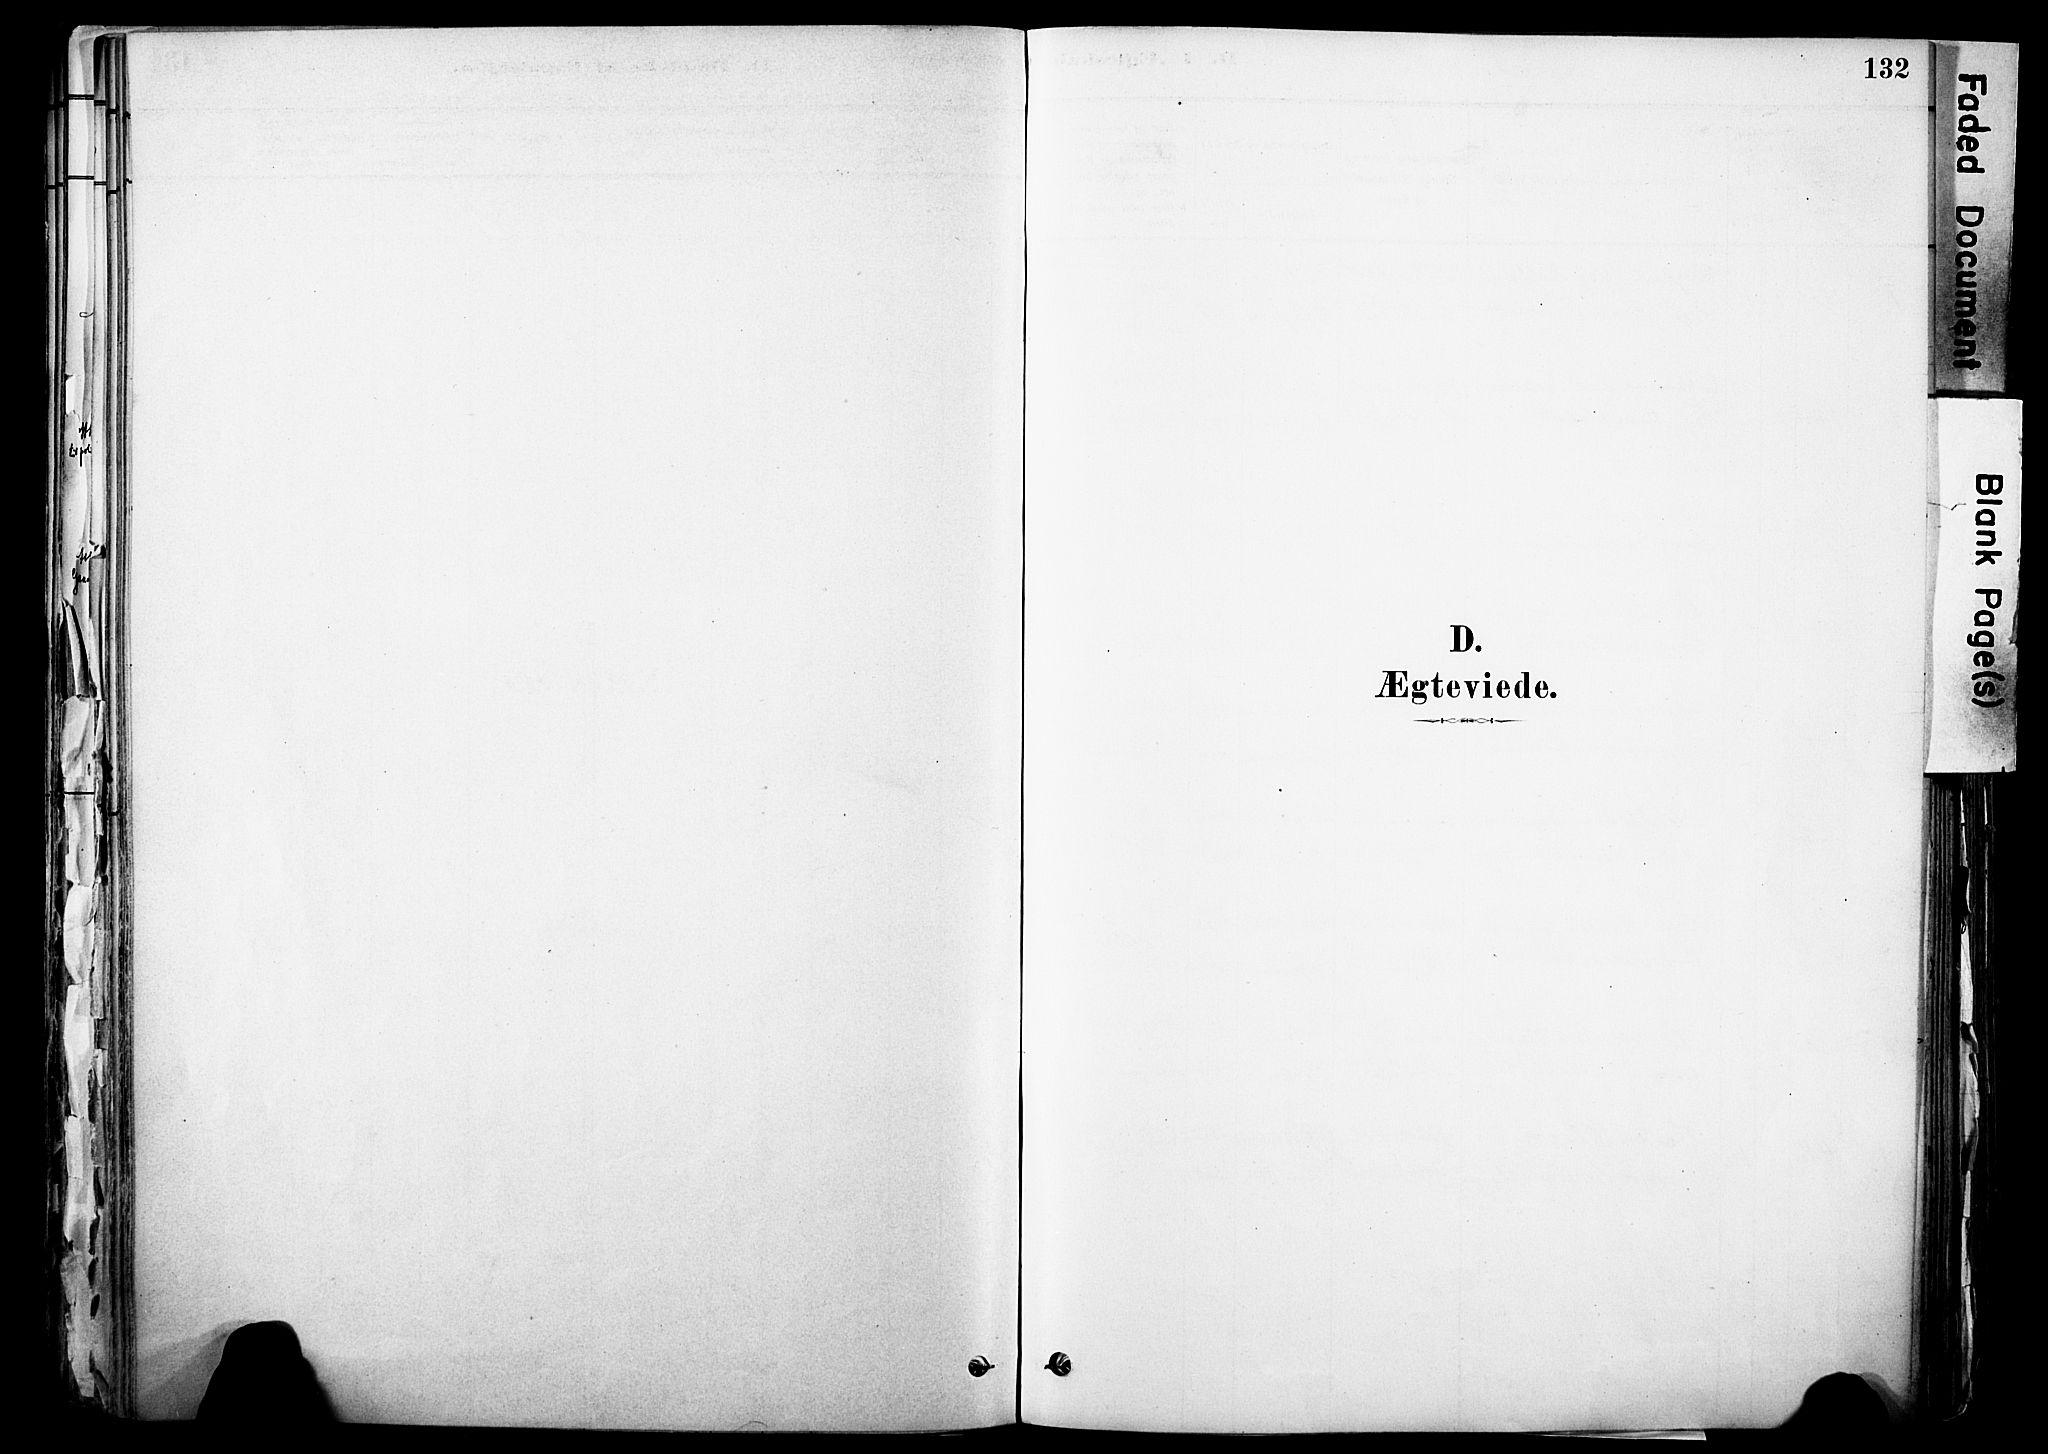 SAH, Skjåk prestekontor, Ministerialbok nr. 3, 1880-1907, s. 132